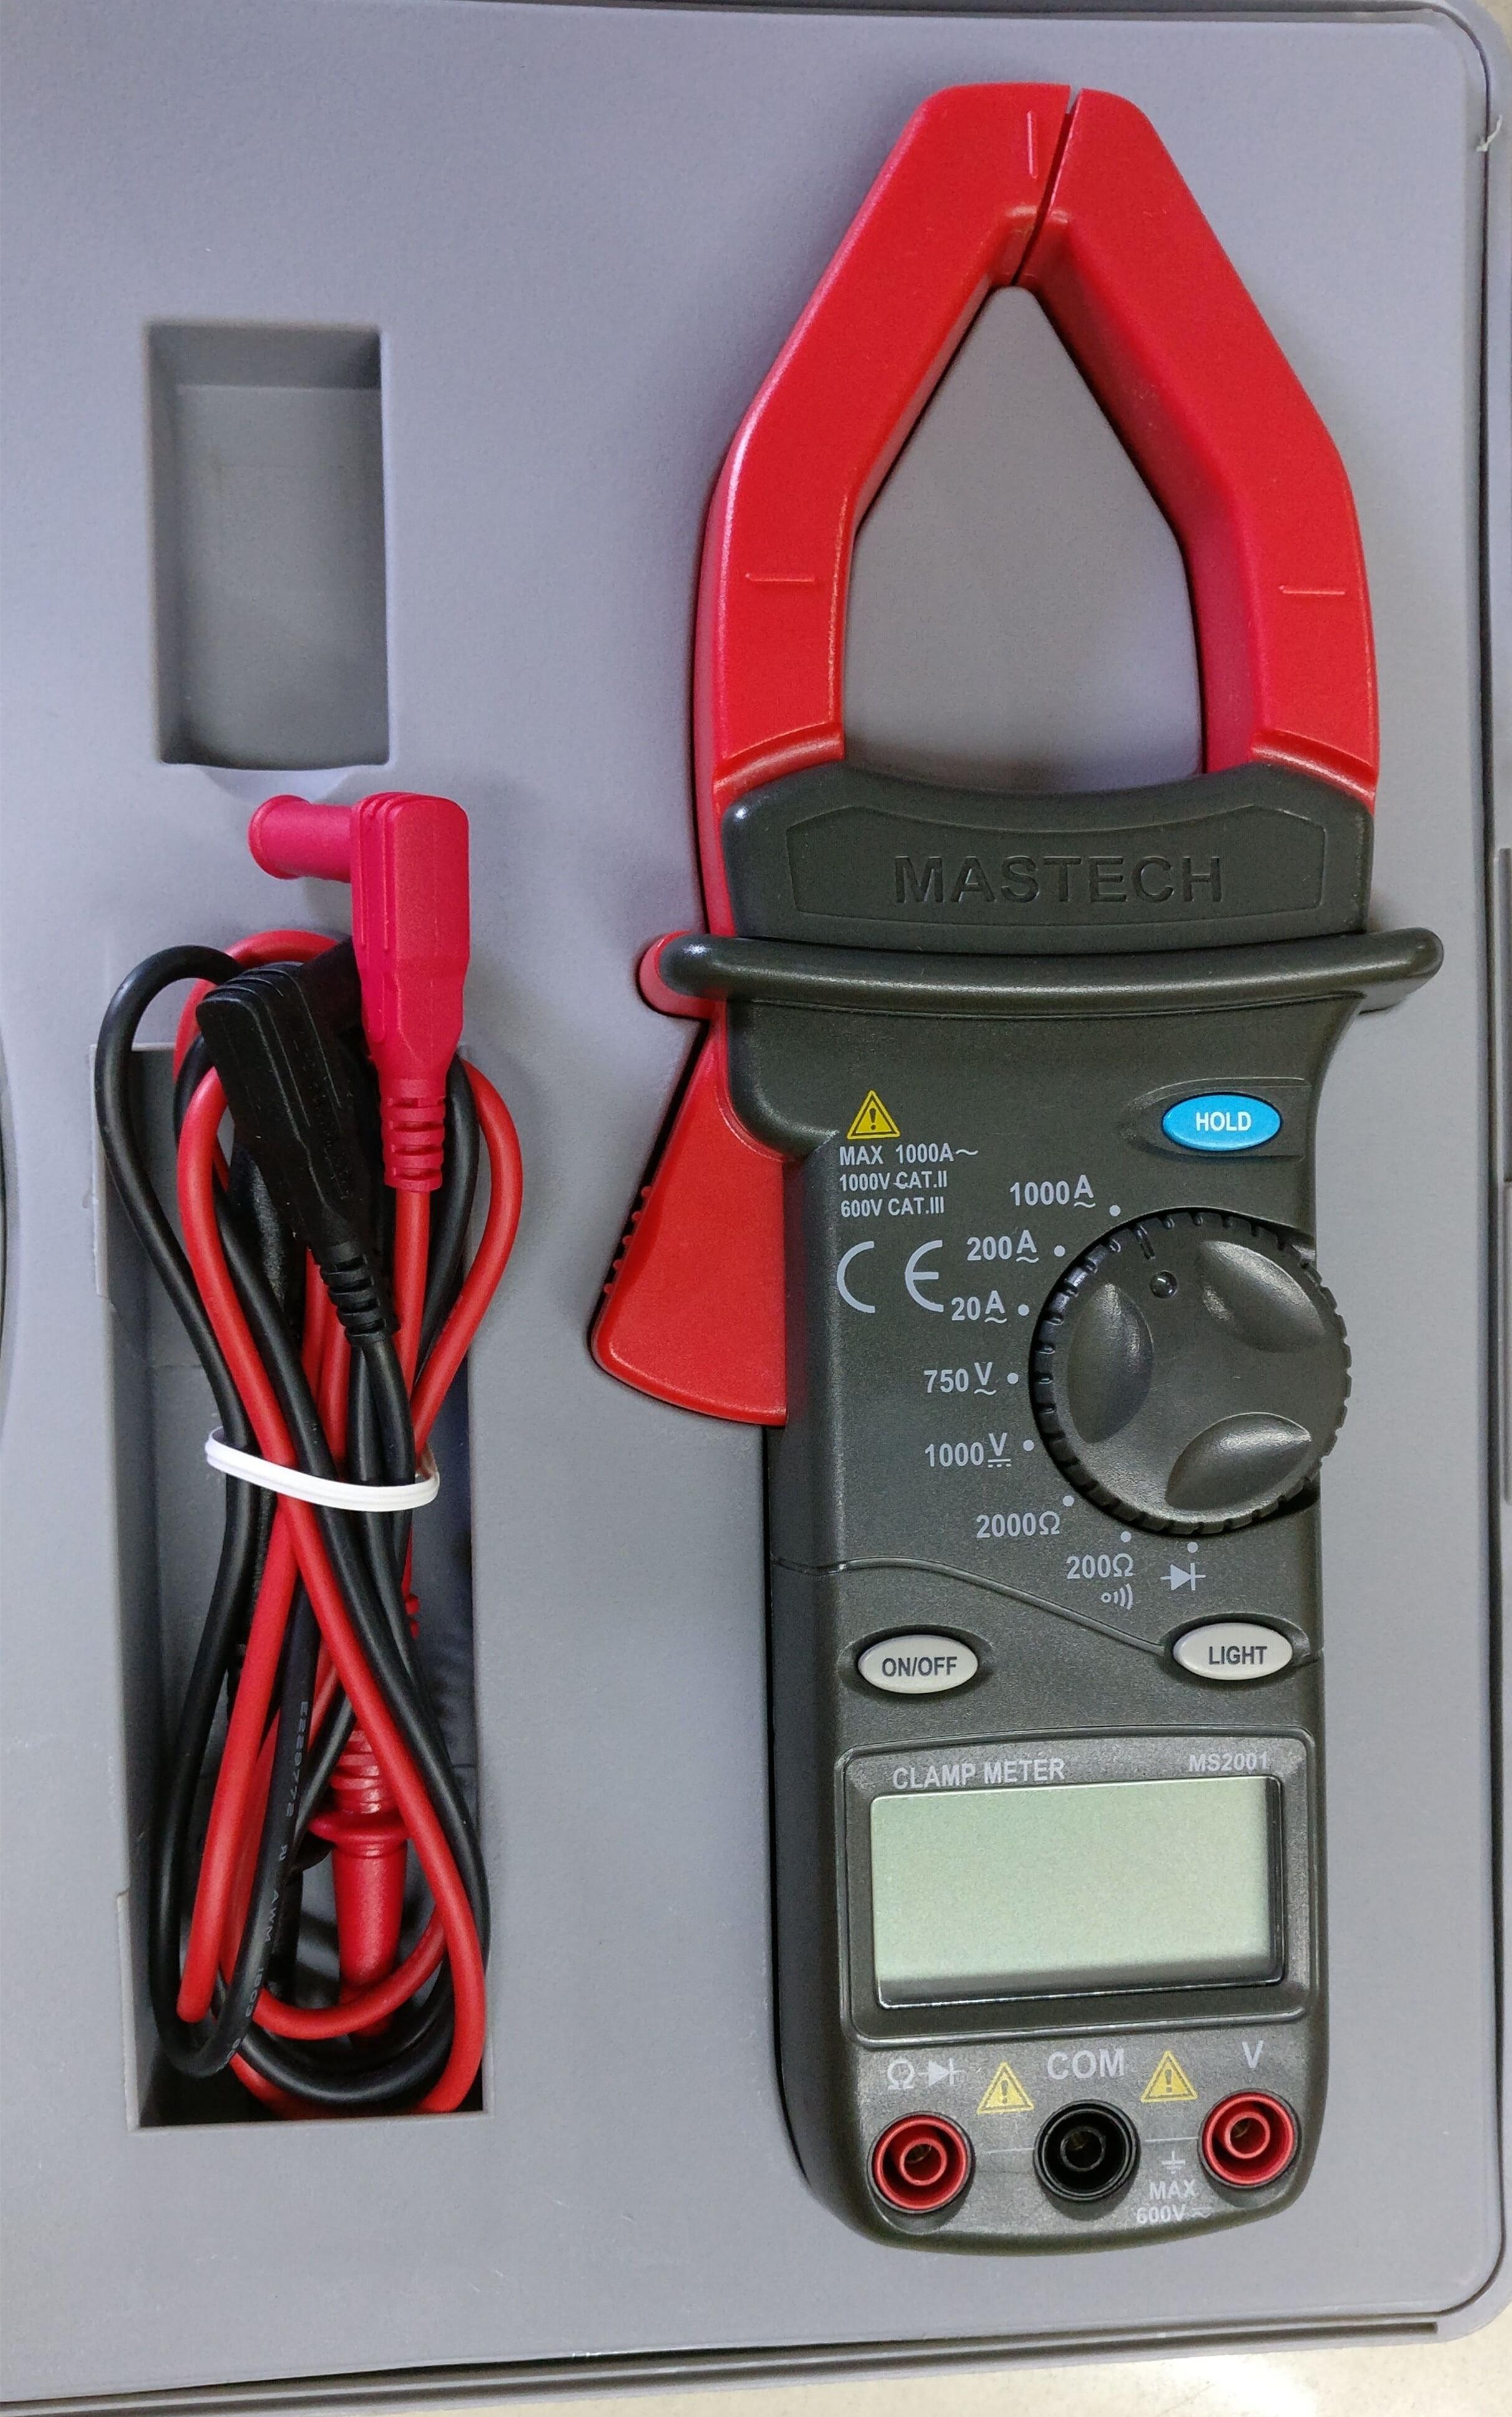 MASTECH AC/DC DIGITAL CLAMP Multimeter measure Current Voltage Resistance Electronic Tester Meter MS2001C mastech m266 digital ac clamp meter ac dc voltage ac current tester